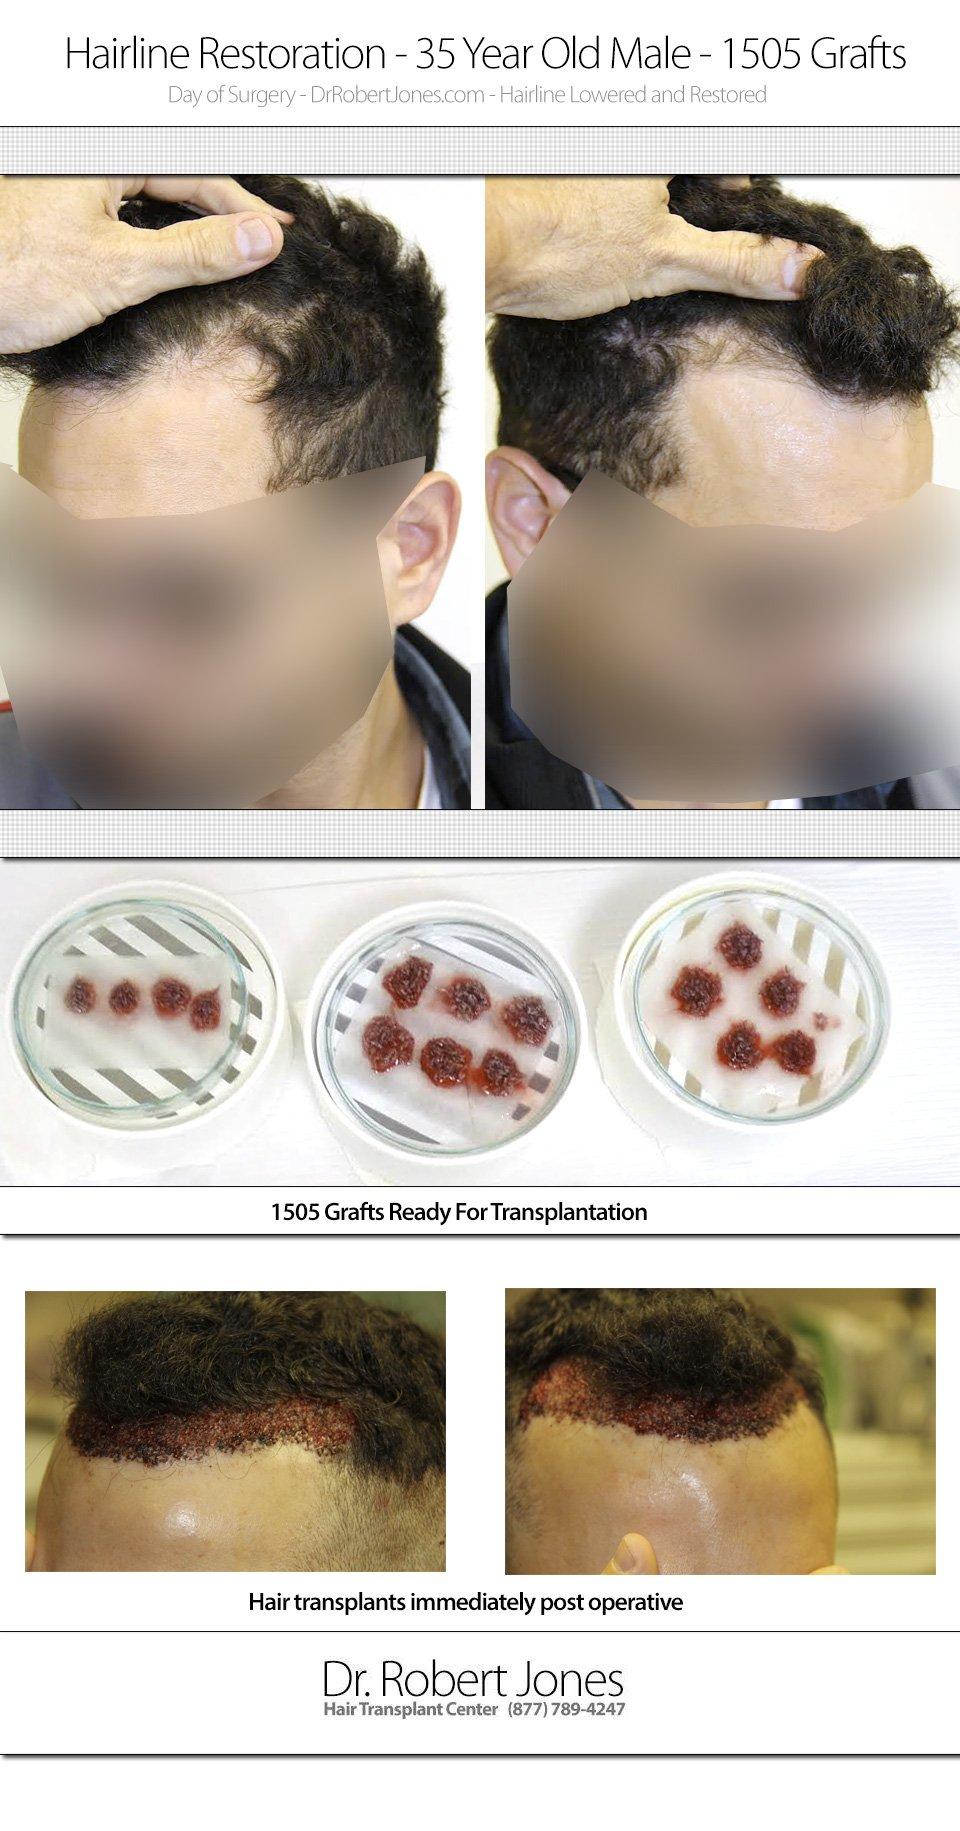 2014-10-22-dr-jones-1505-35-yo-hairline-restoratio-img-1